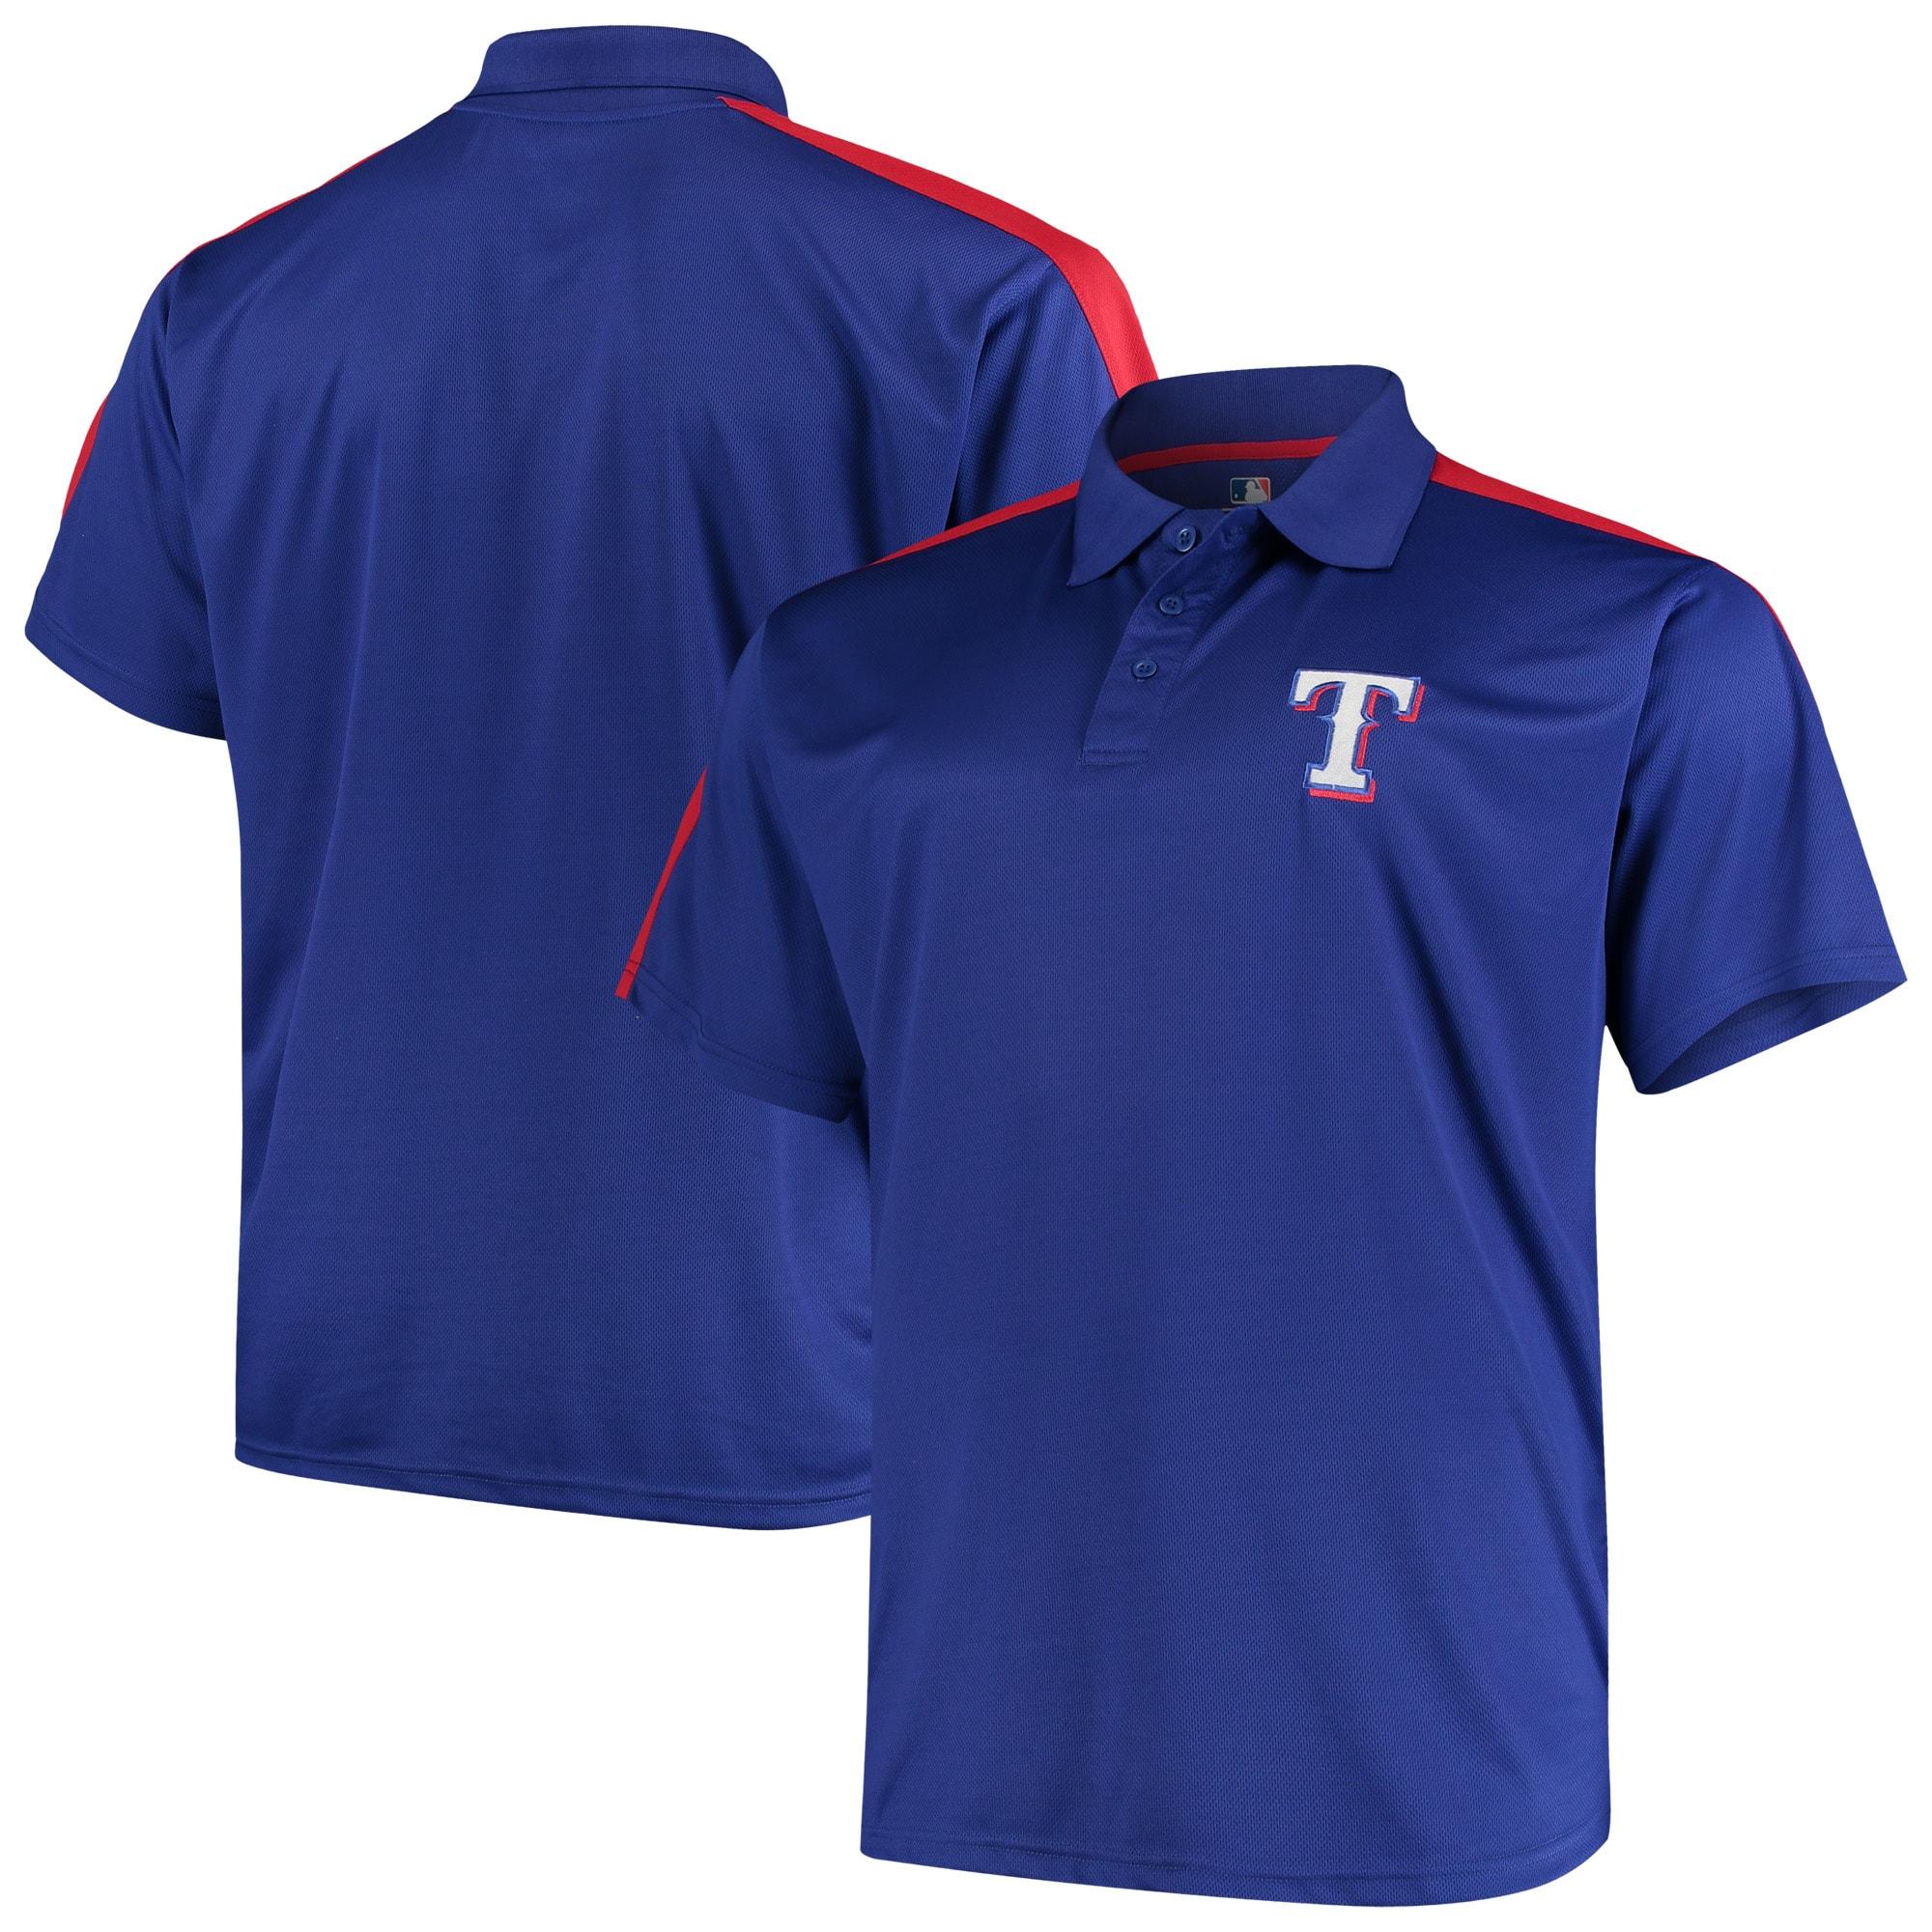 Texas Rangers Big & Tall 2-Tone Birdseye Polo - Royal/Red